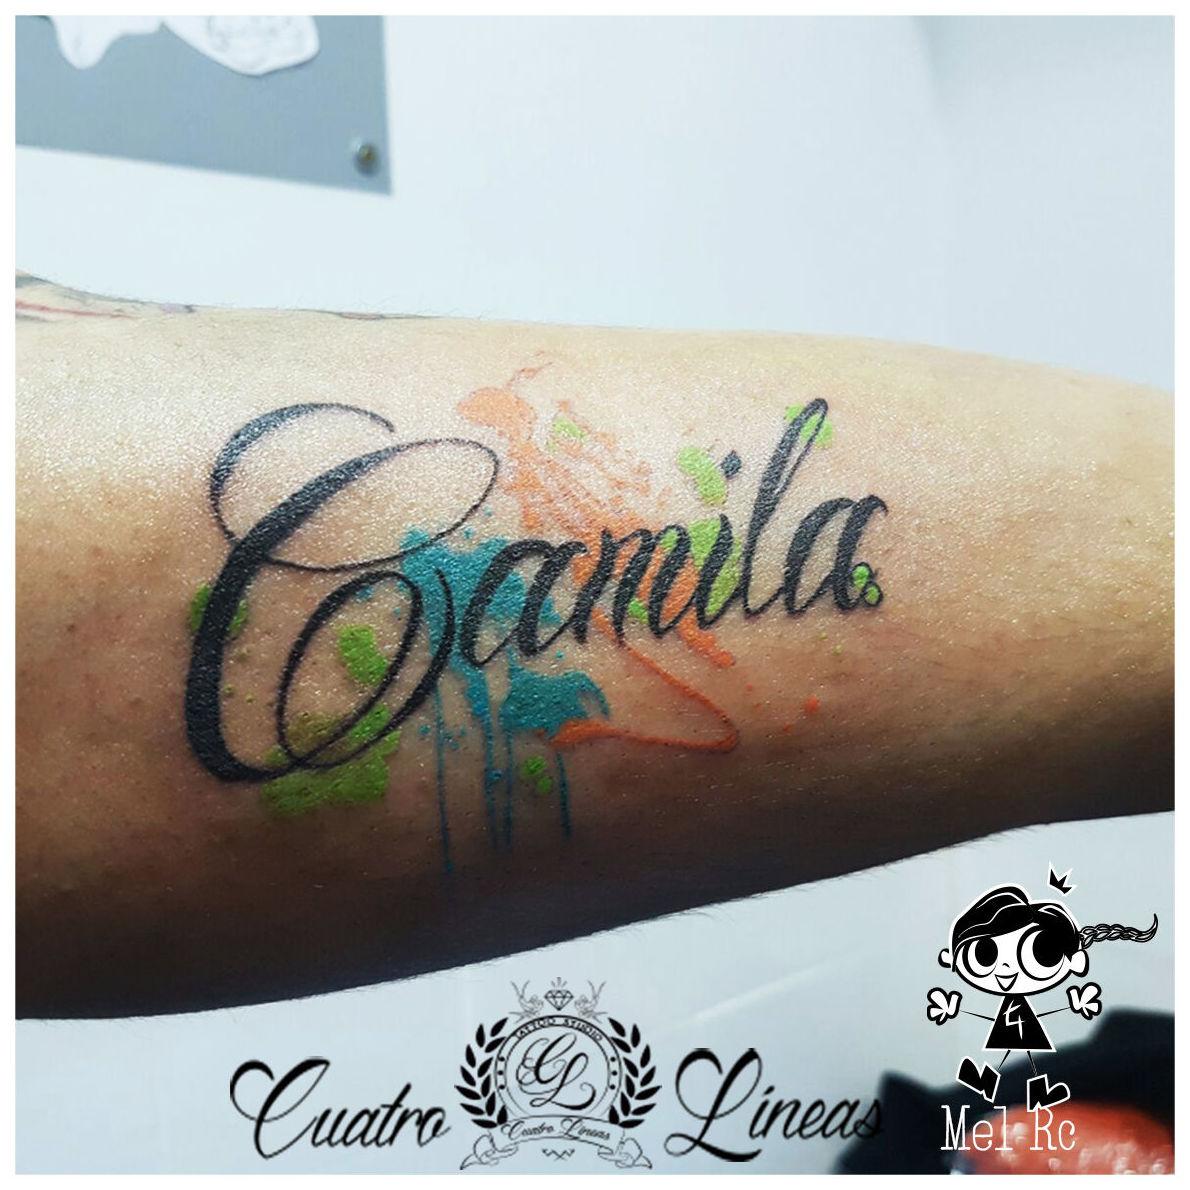 lettering tatuaje madrid carabanchel